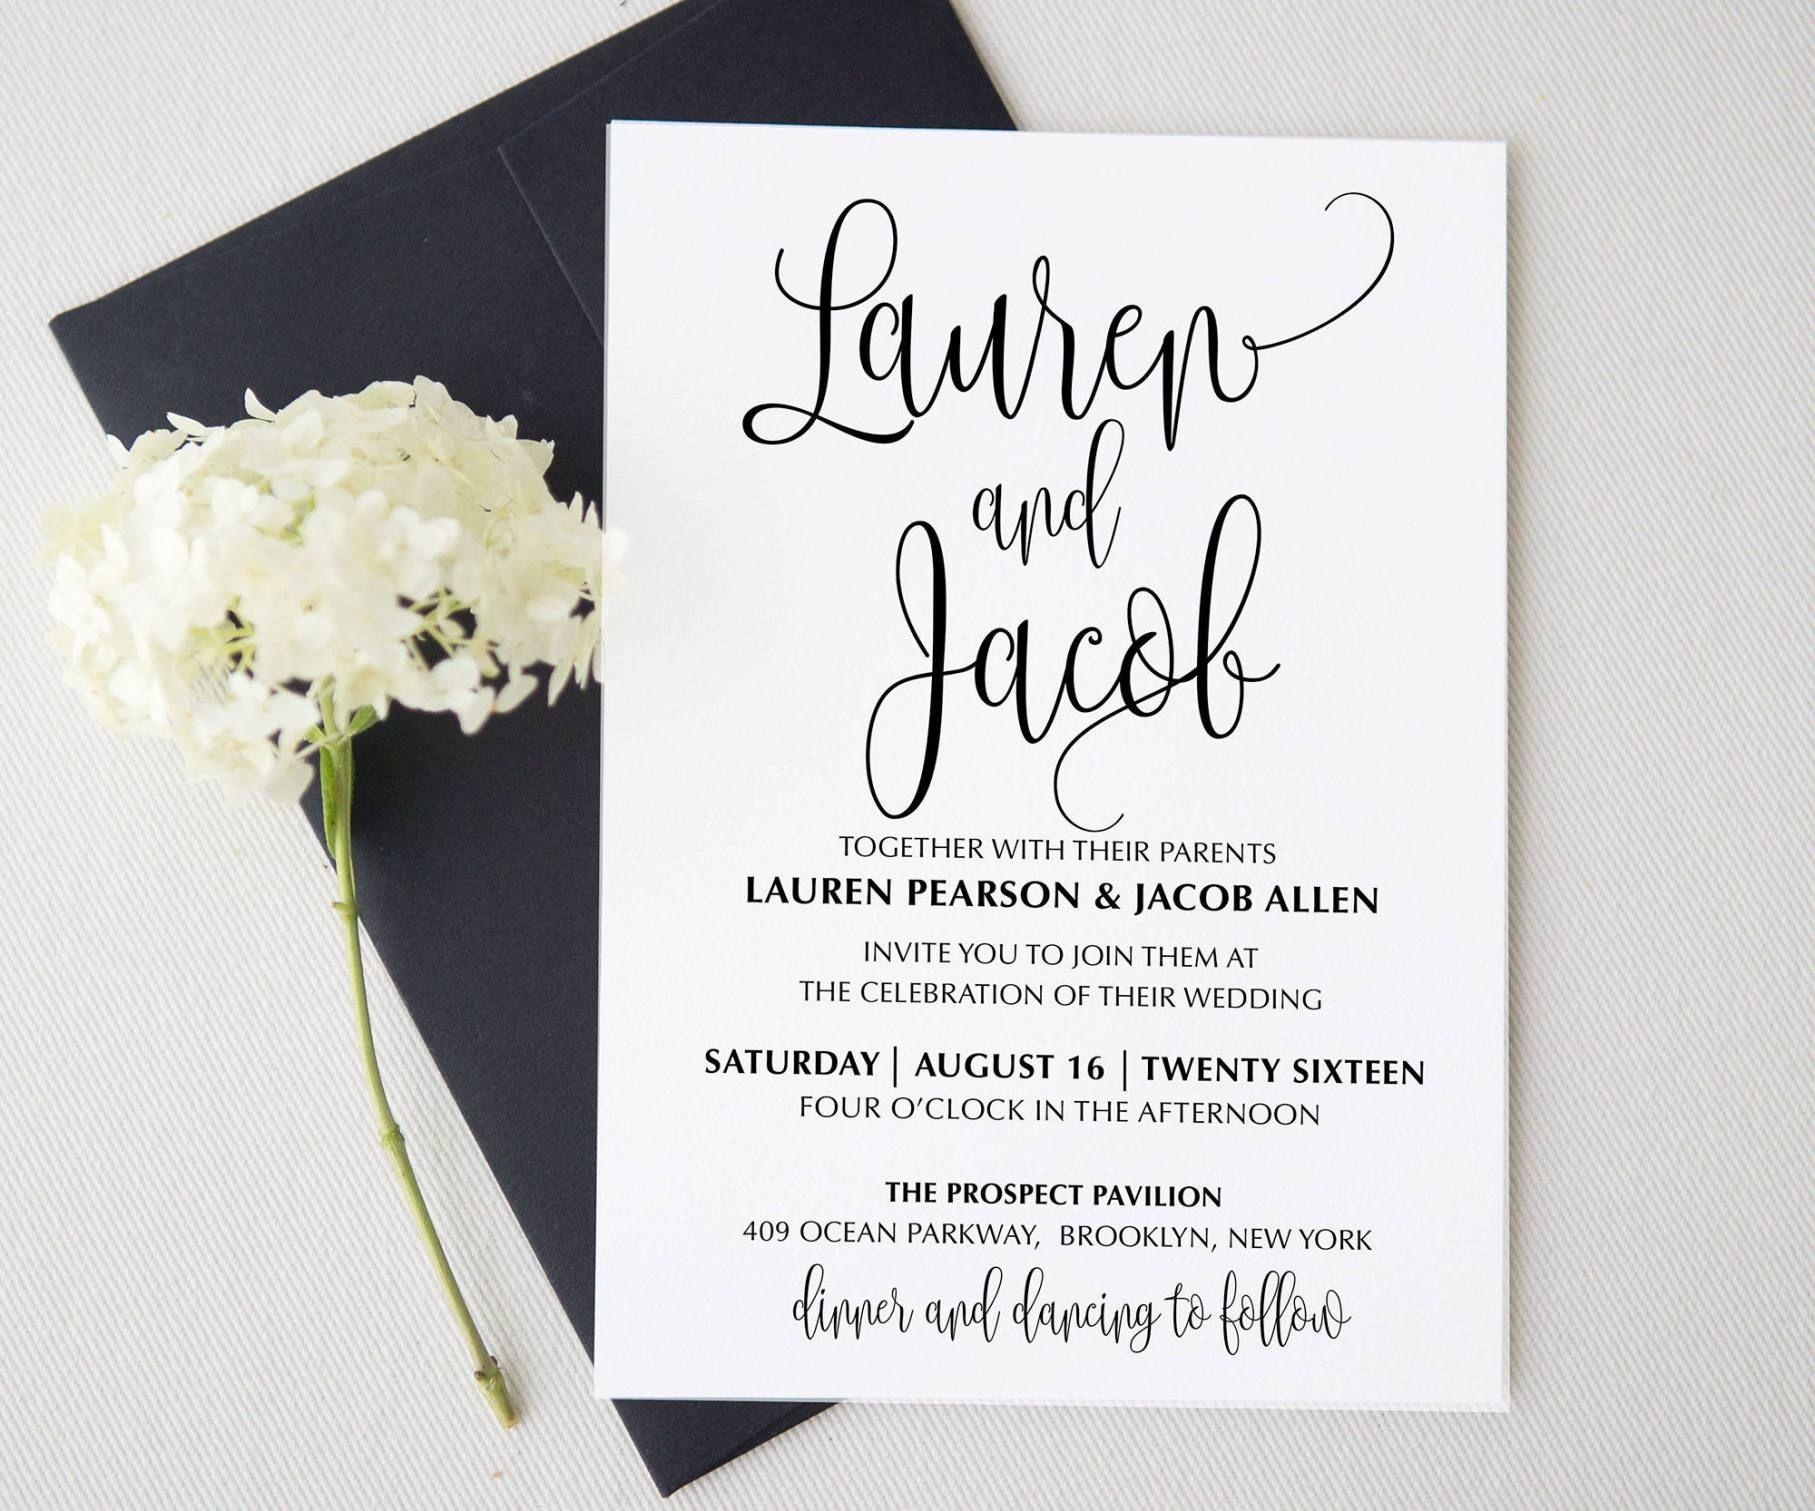 15 Etsy Wedding Invitations | Weddings